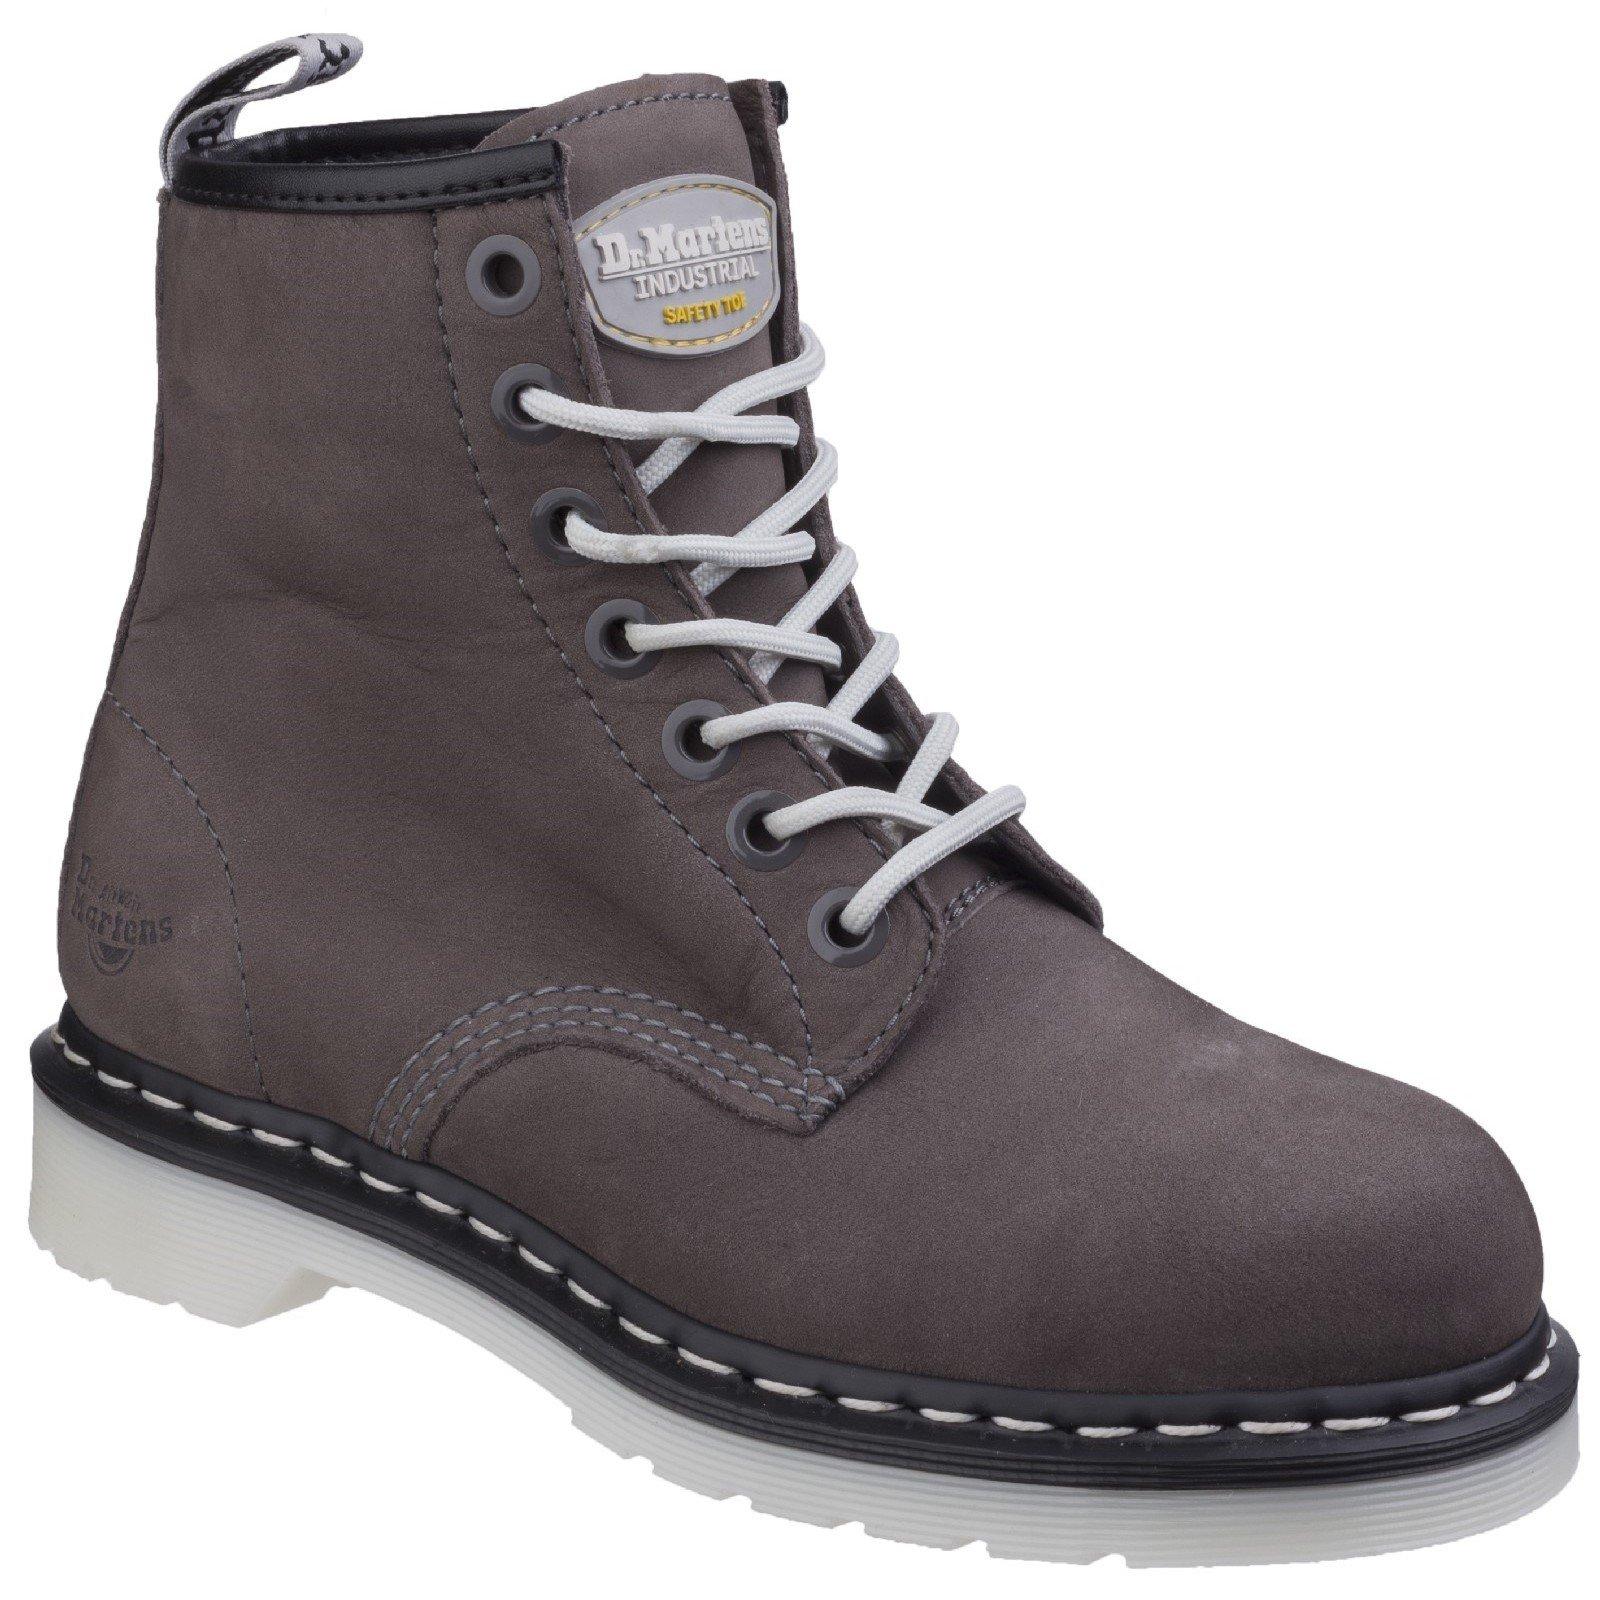 Dr Martens Women's Maple Classic Steel-Toe Work Boot Grey 26783 - Grey Wind River 5